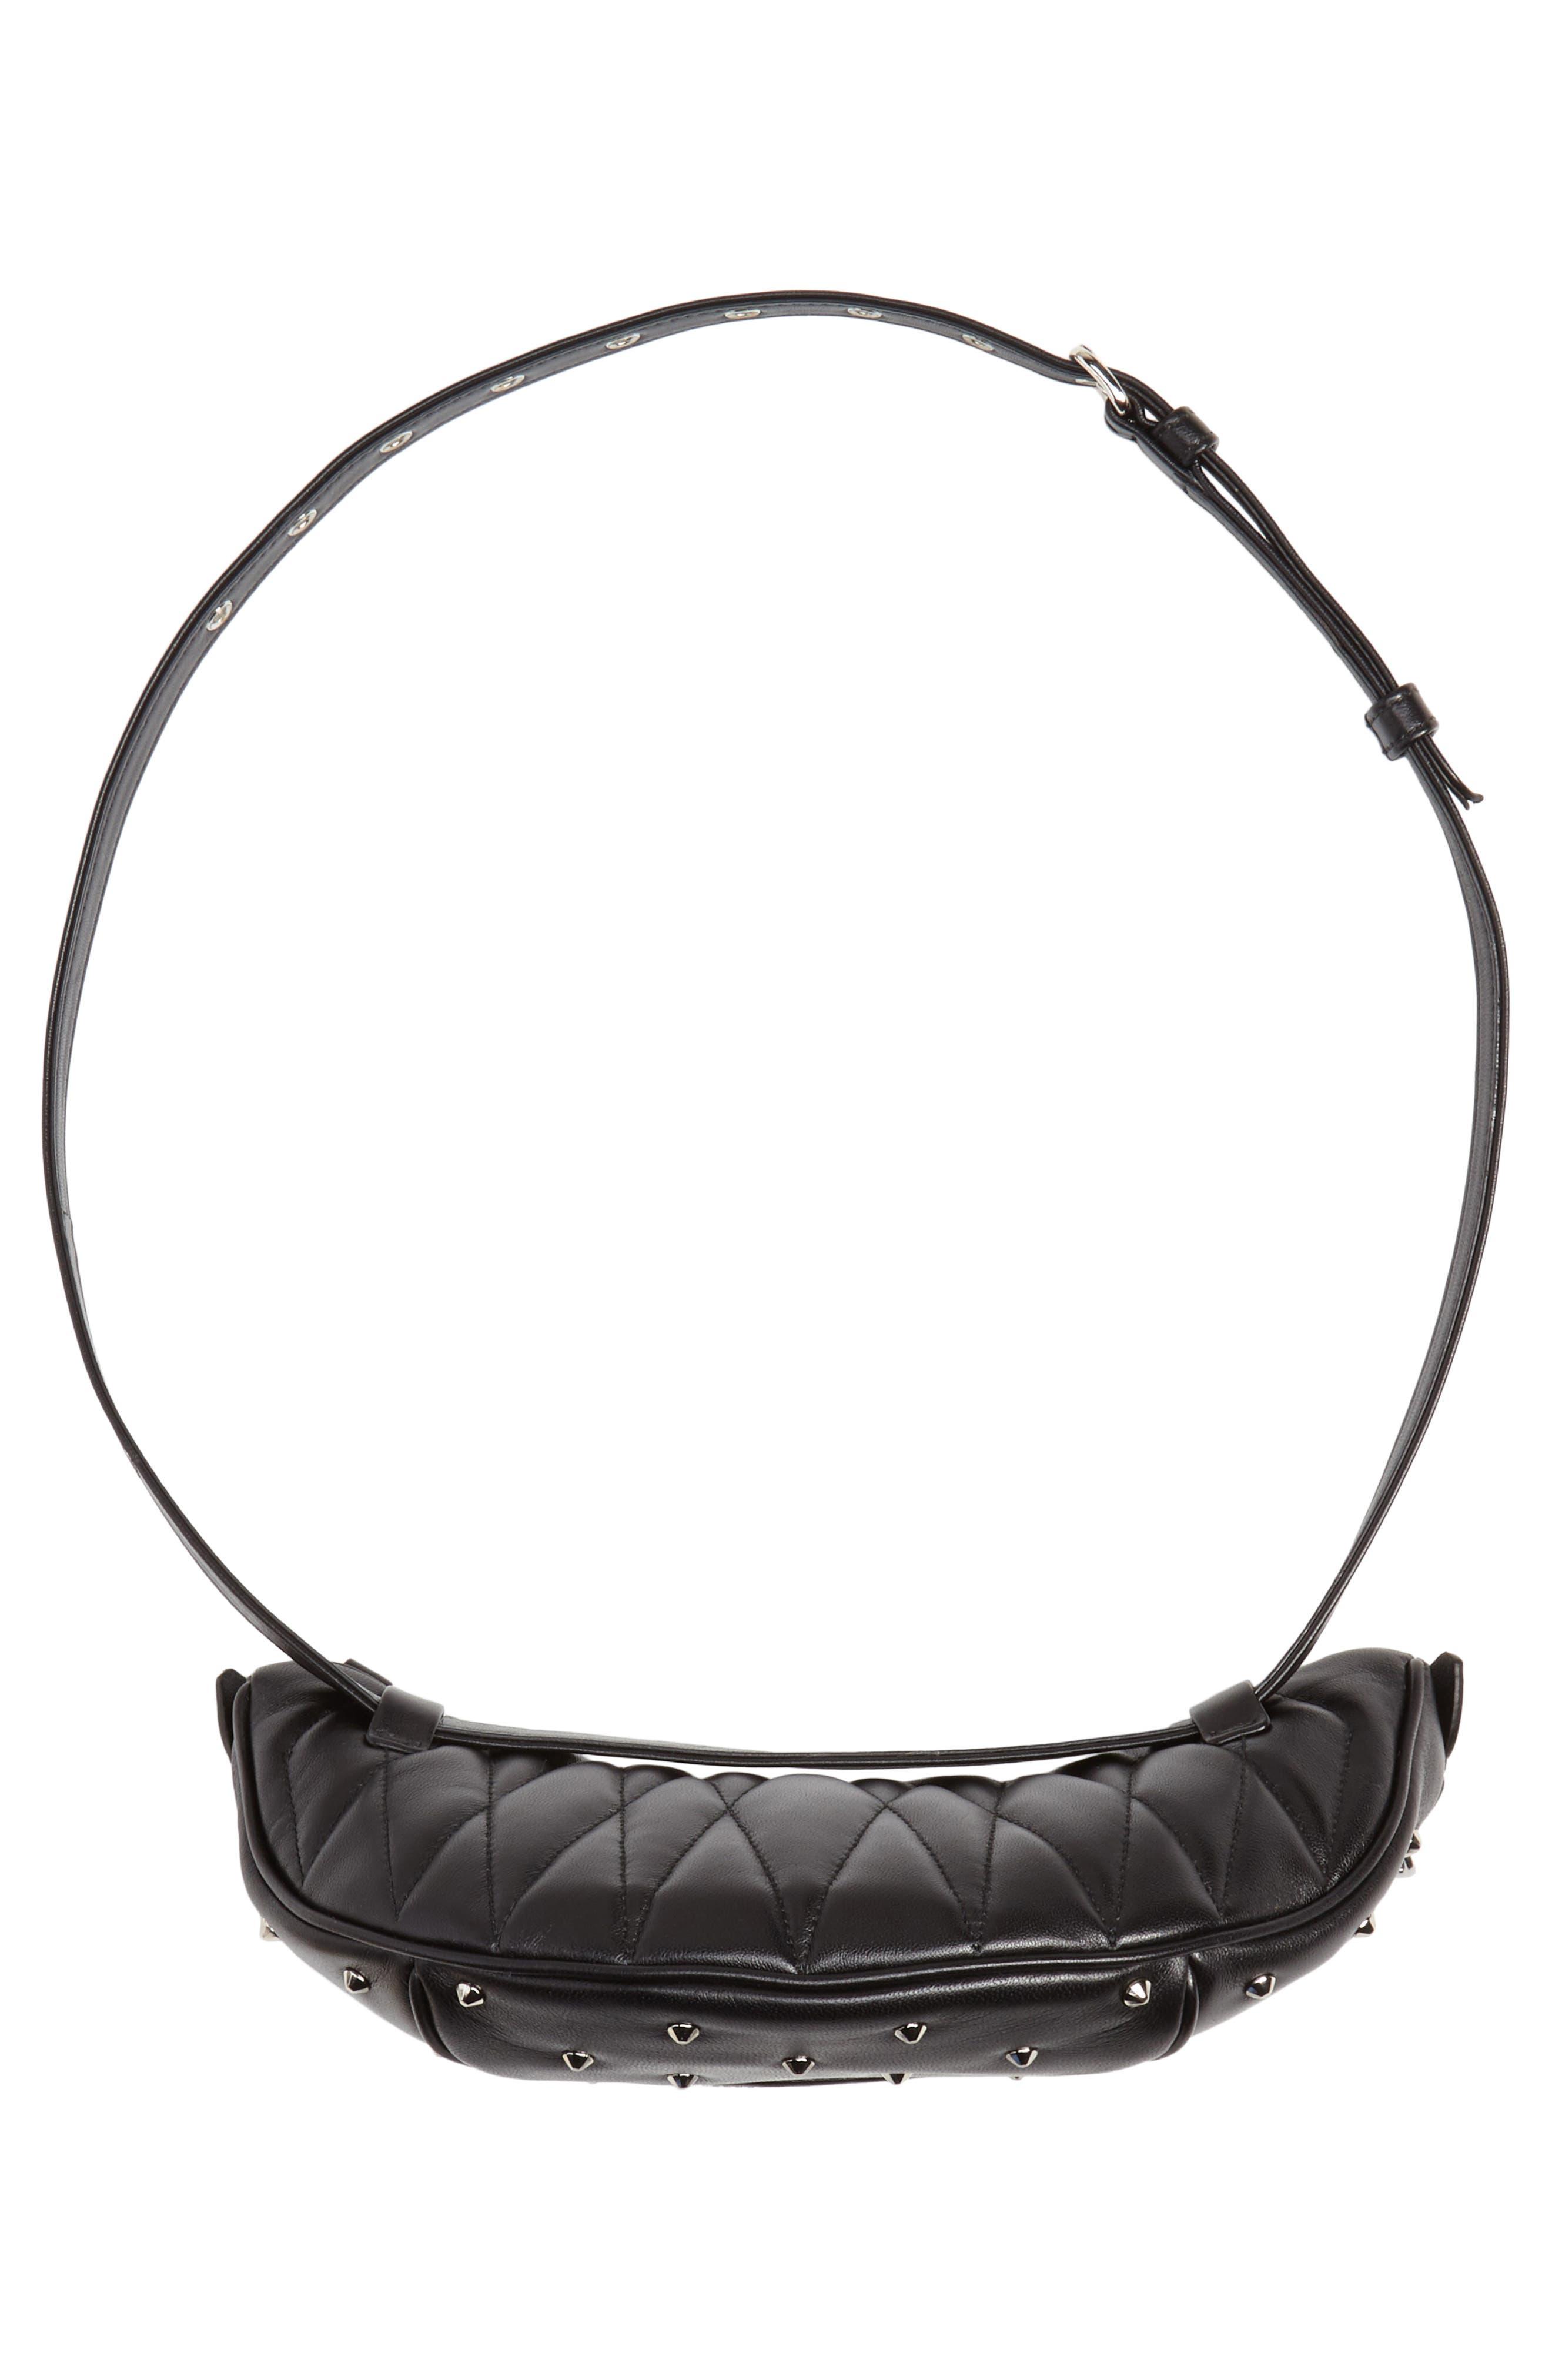 Studded Lambskin Leather Belt Bag,                             Alternate thumbnail 8, color,                             NERO